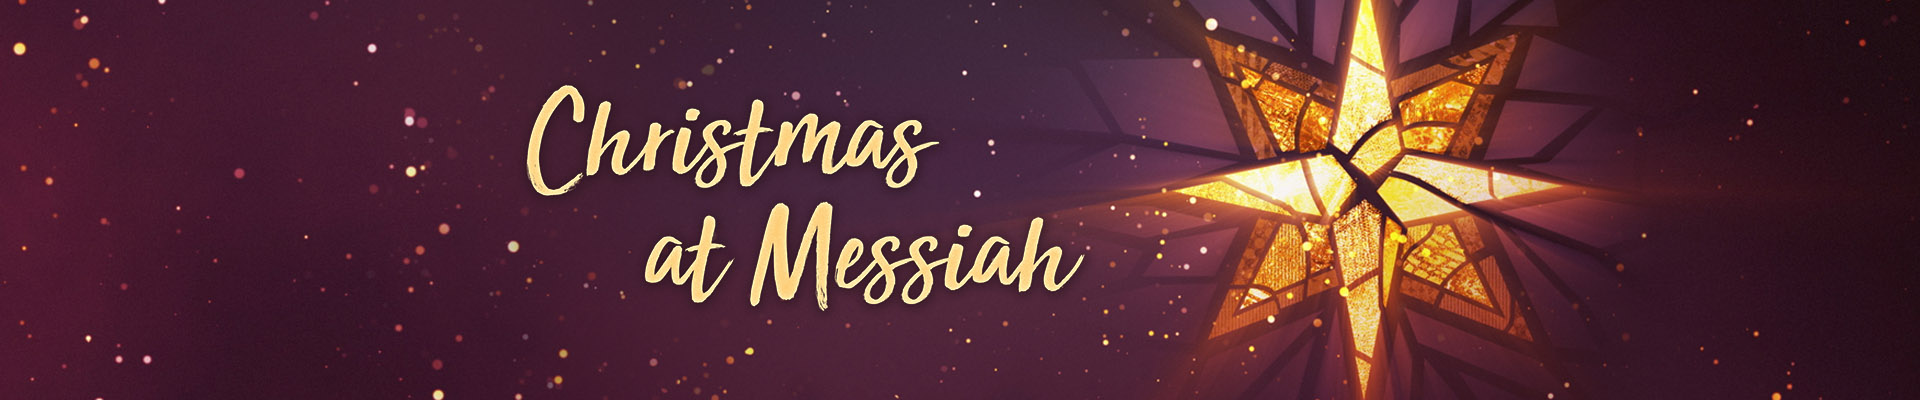 christmas at messiah layerslider